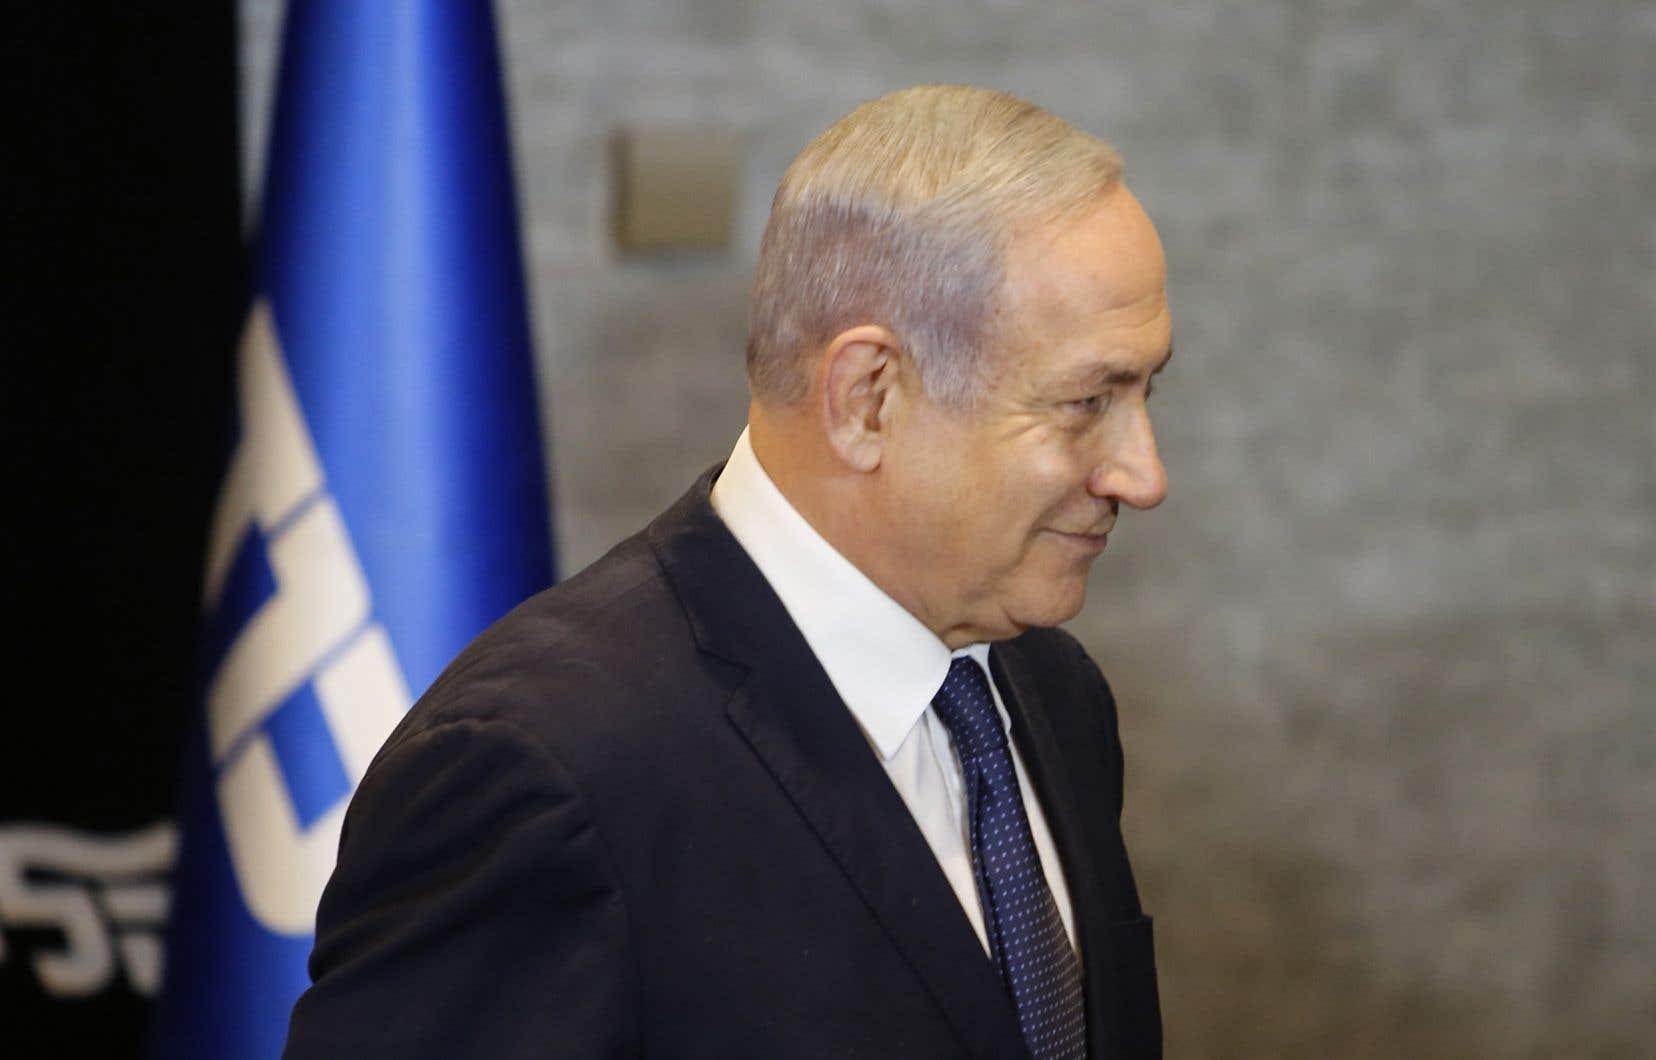 Le premier ministre d'Israël, Benjamin Nétanyahou